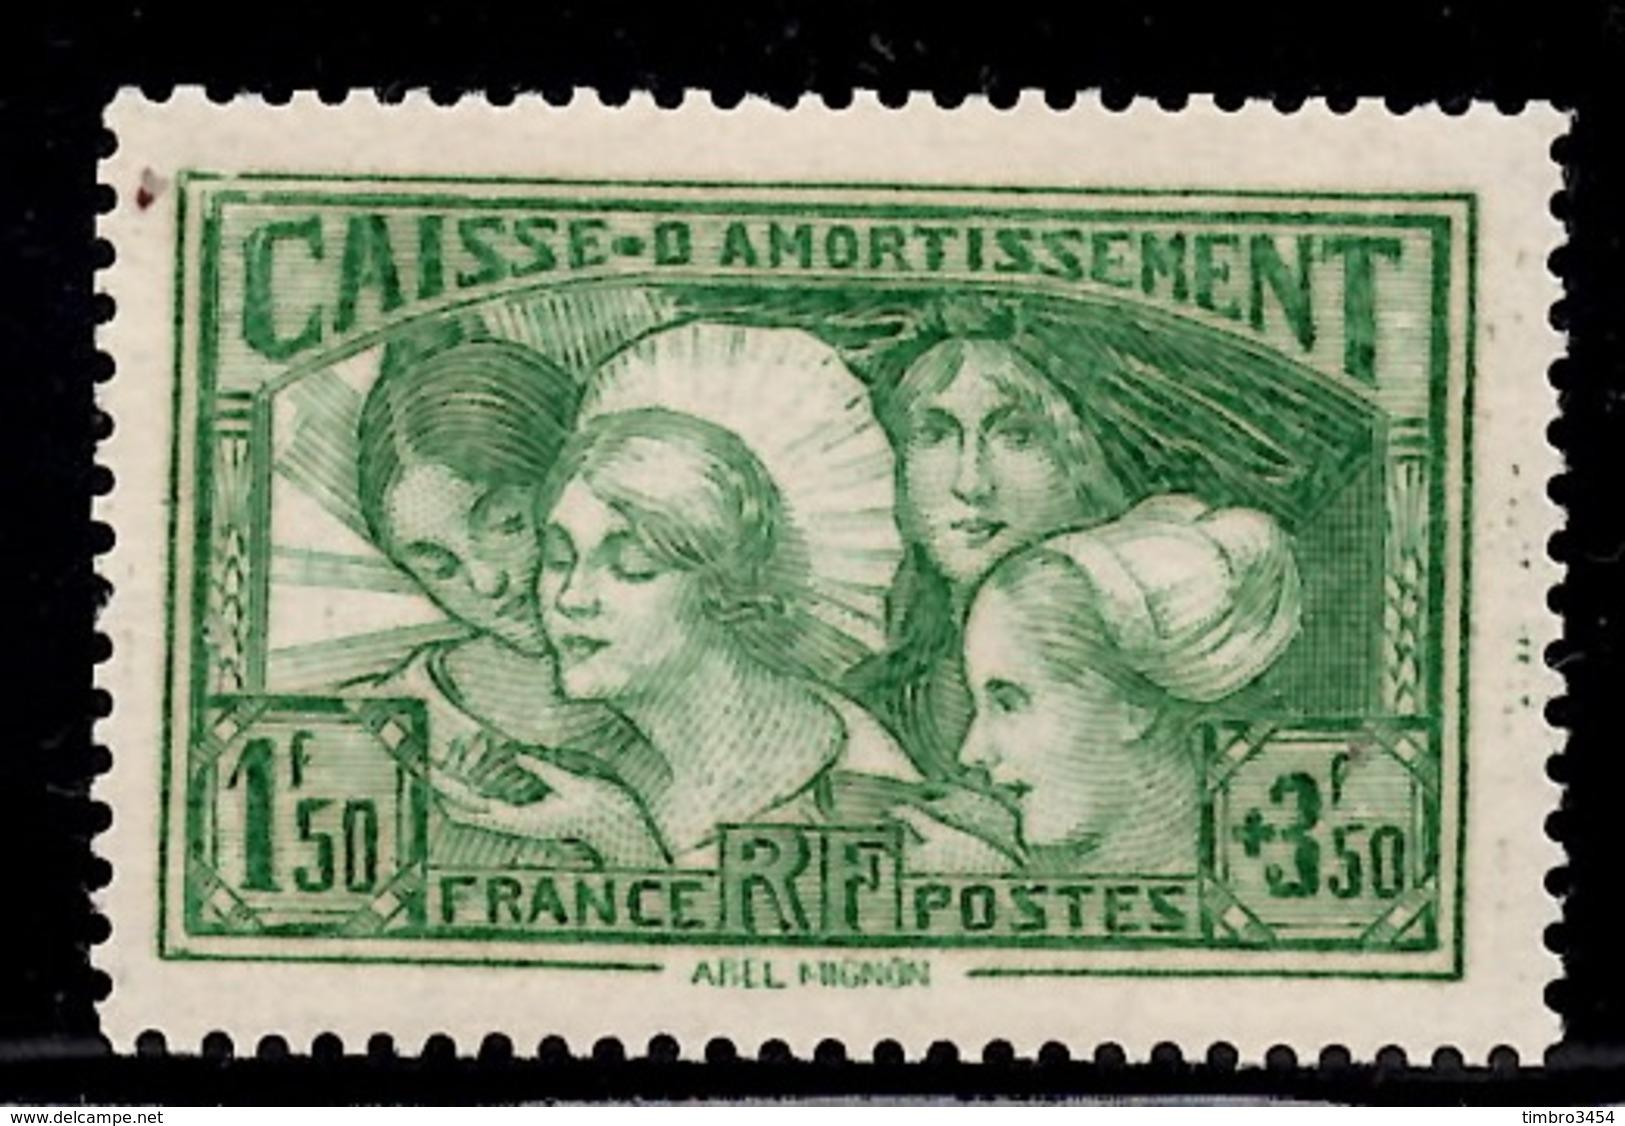 France Les Provinces YT N° 269 Neuf *. Gomme D'origine. B/TB. A Saisir! - Neufs